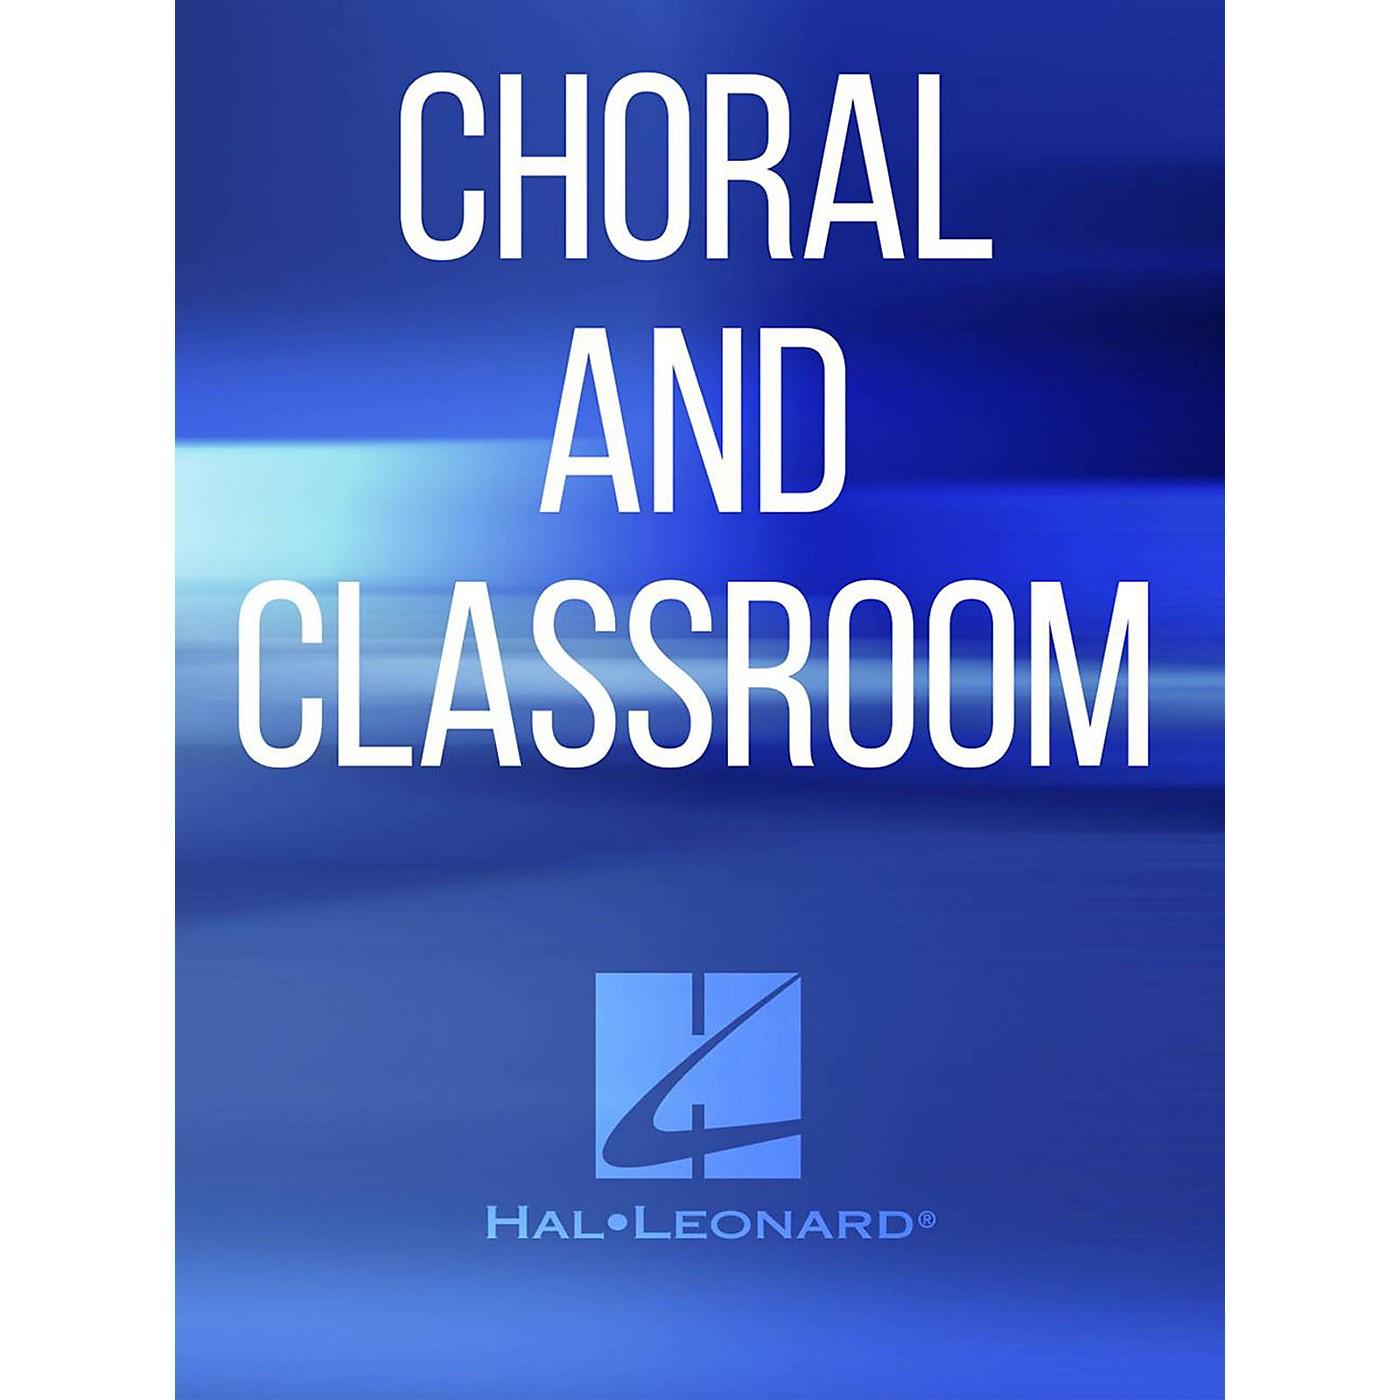 Hal Leonard Jing-a-Ling, Jing-a-Ling SAB by Andrews Sisters Arranged by Mac Huff thumbnail